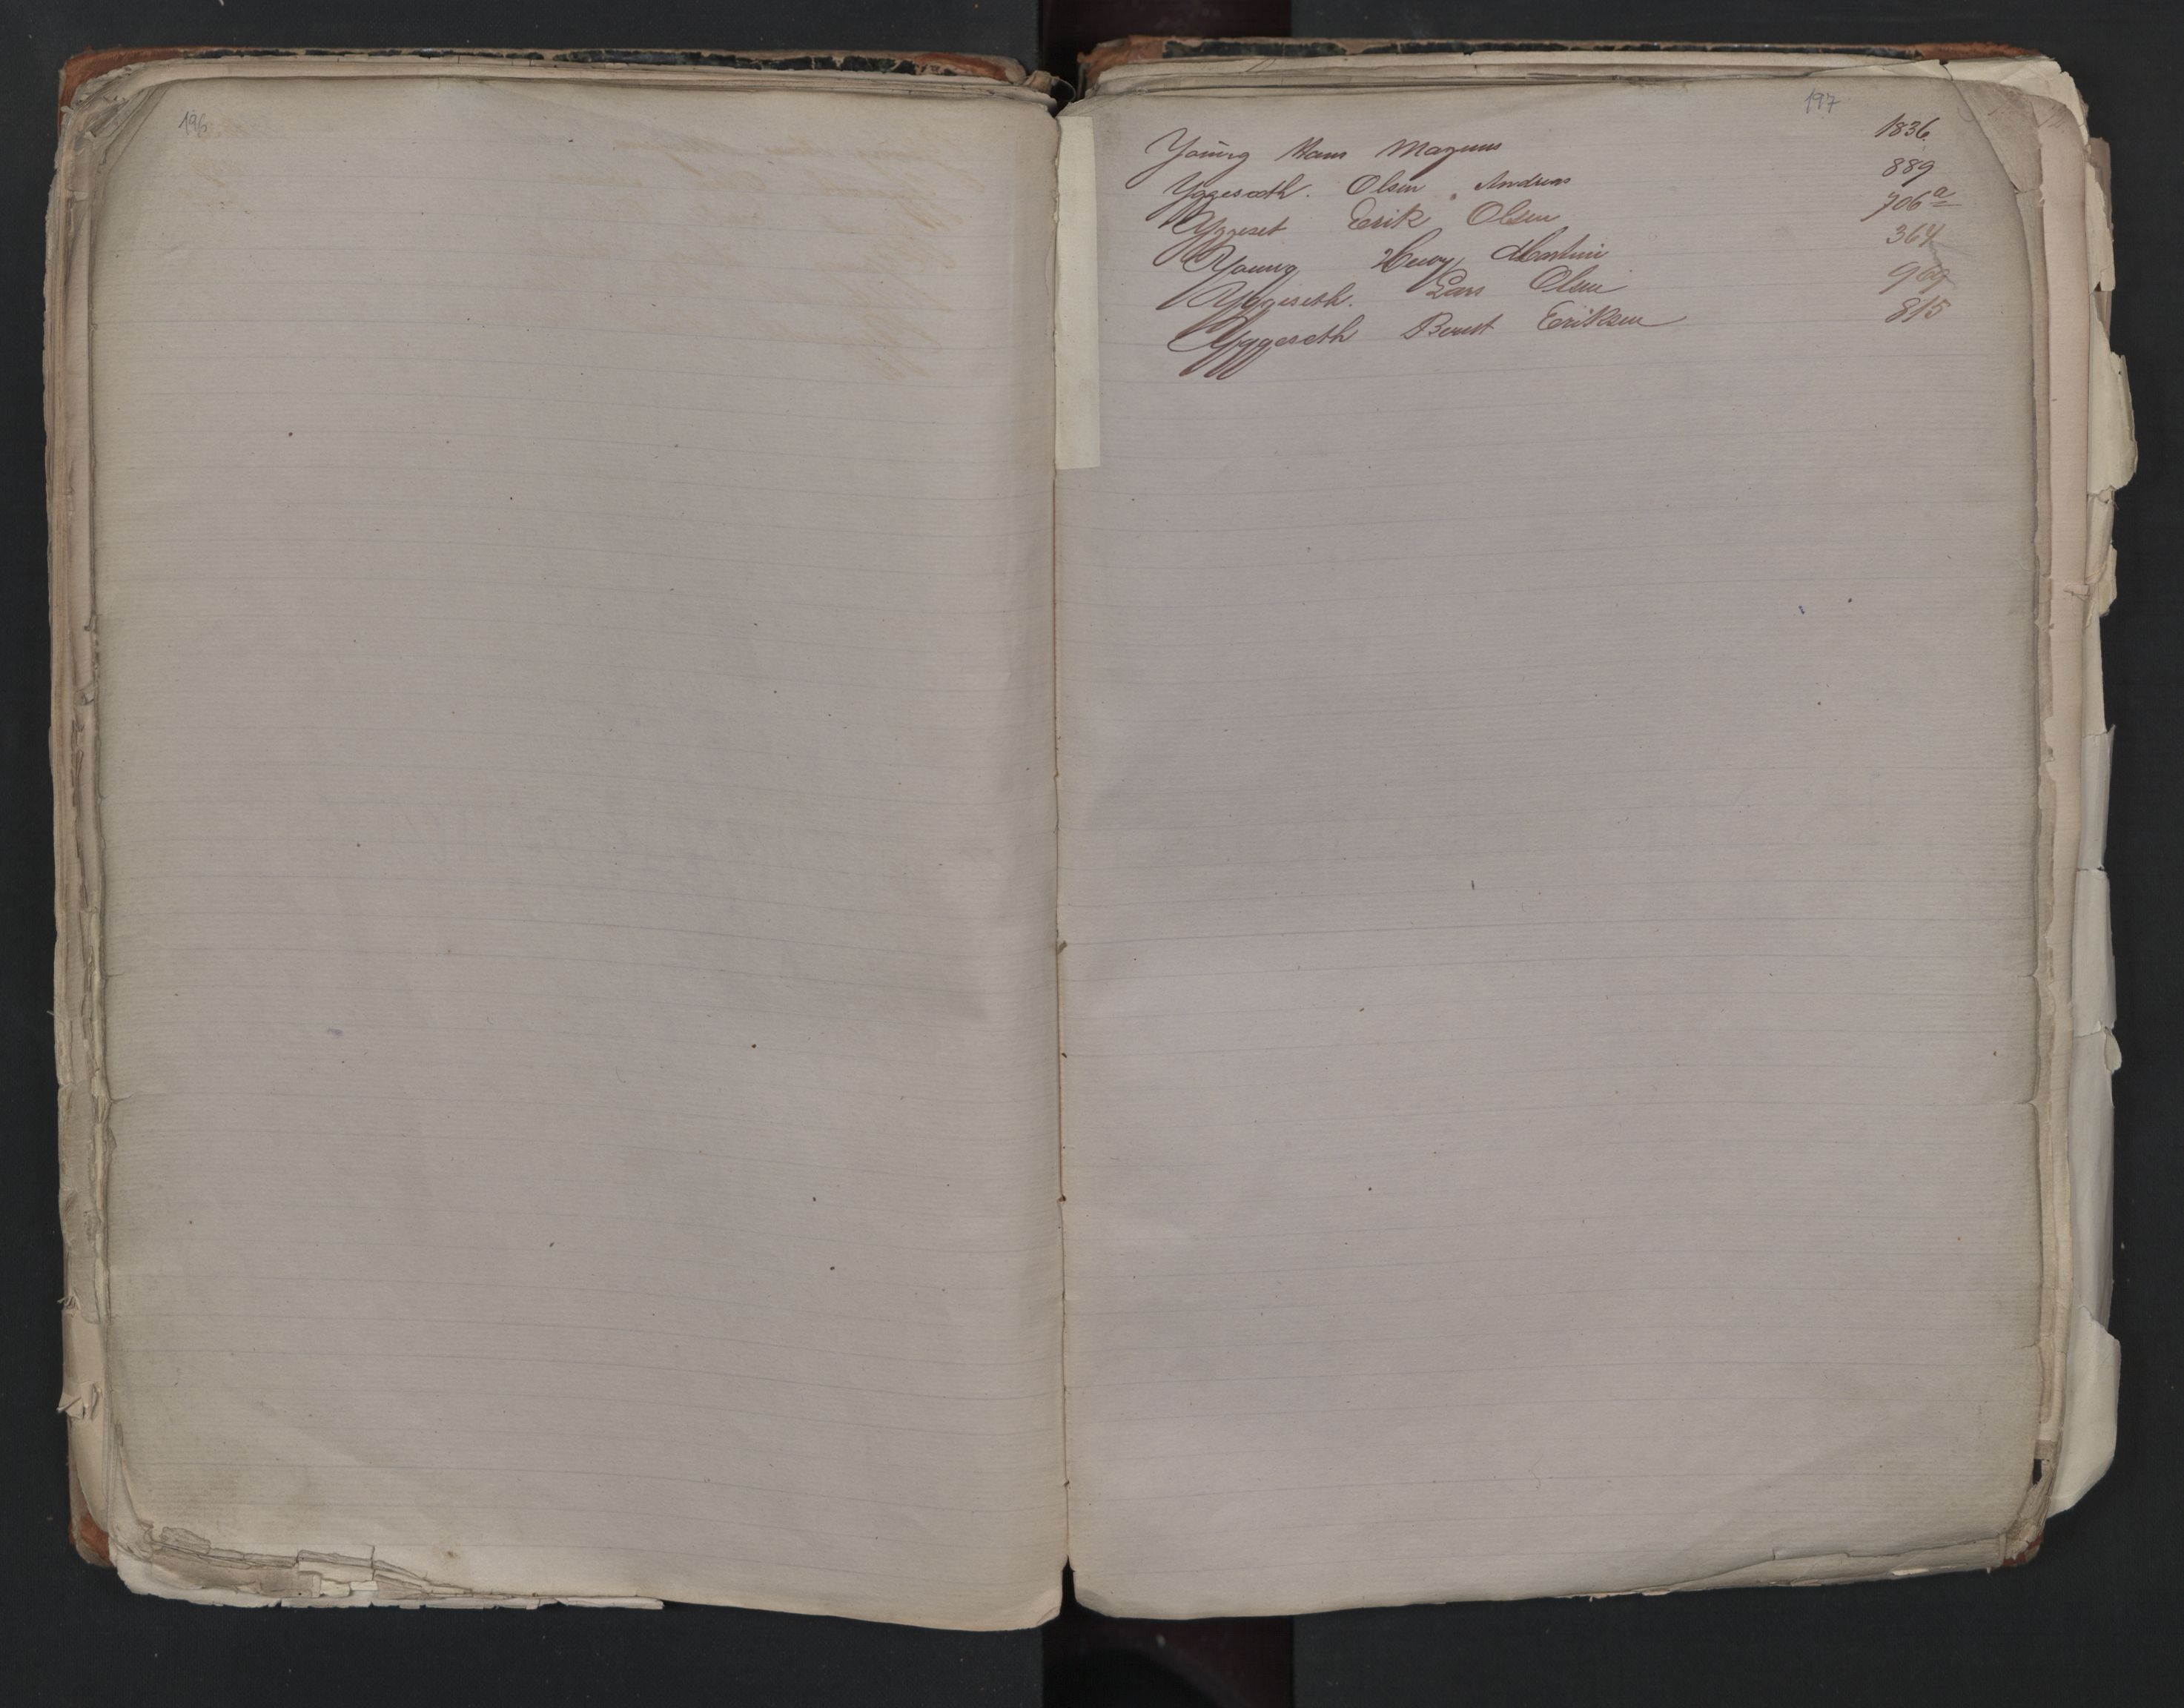 SAO, Oslo sjømannskontor, F/Fa/L0001: Register for Kristiania krets, 1866-1891, s. 196-197